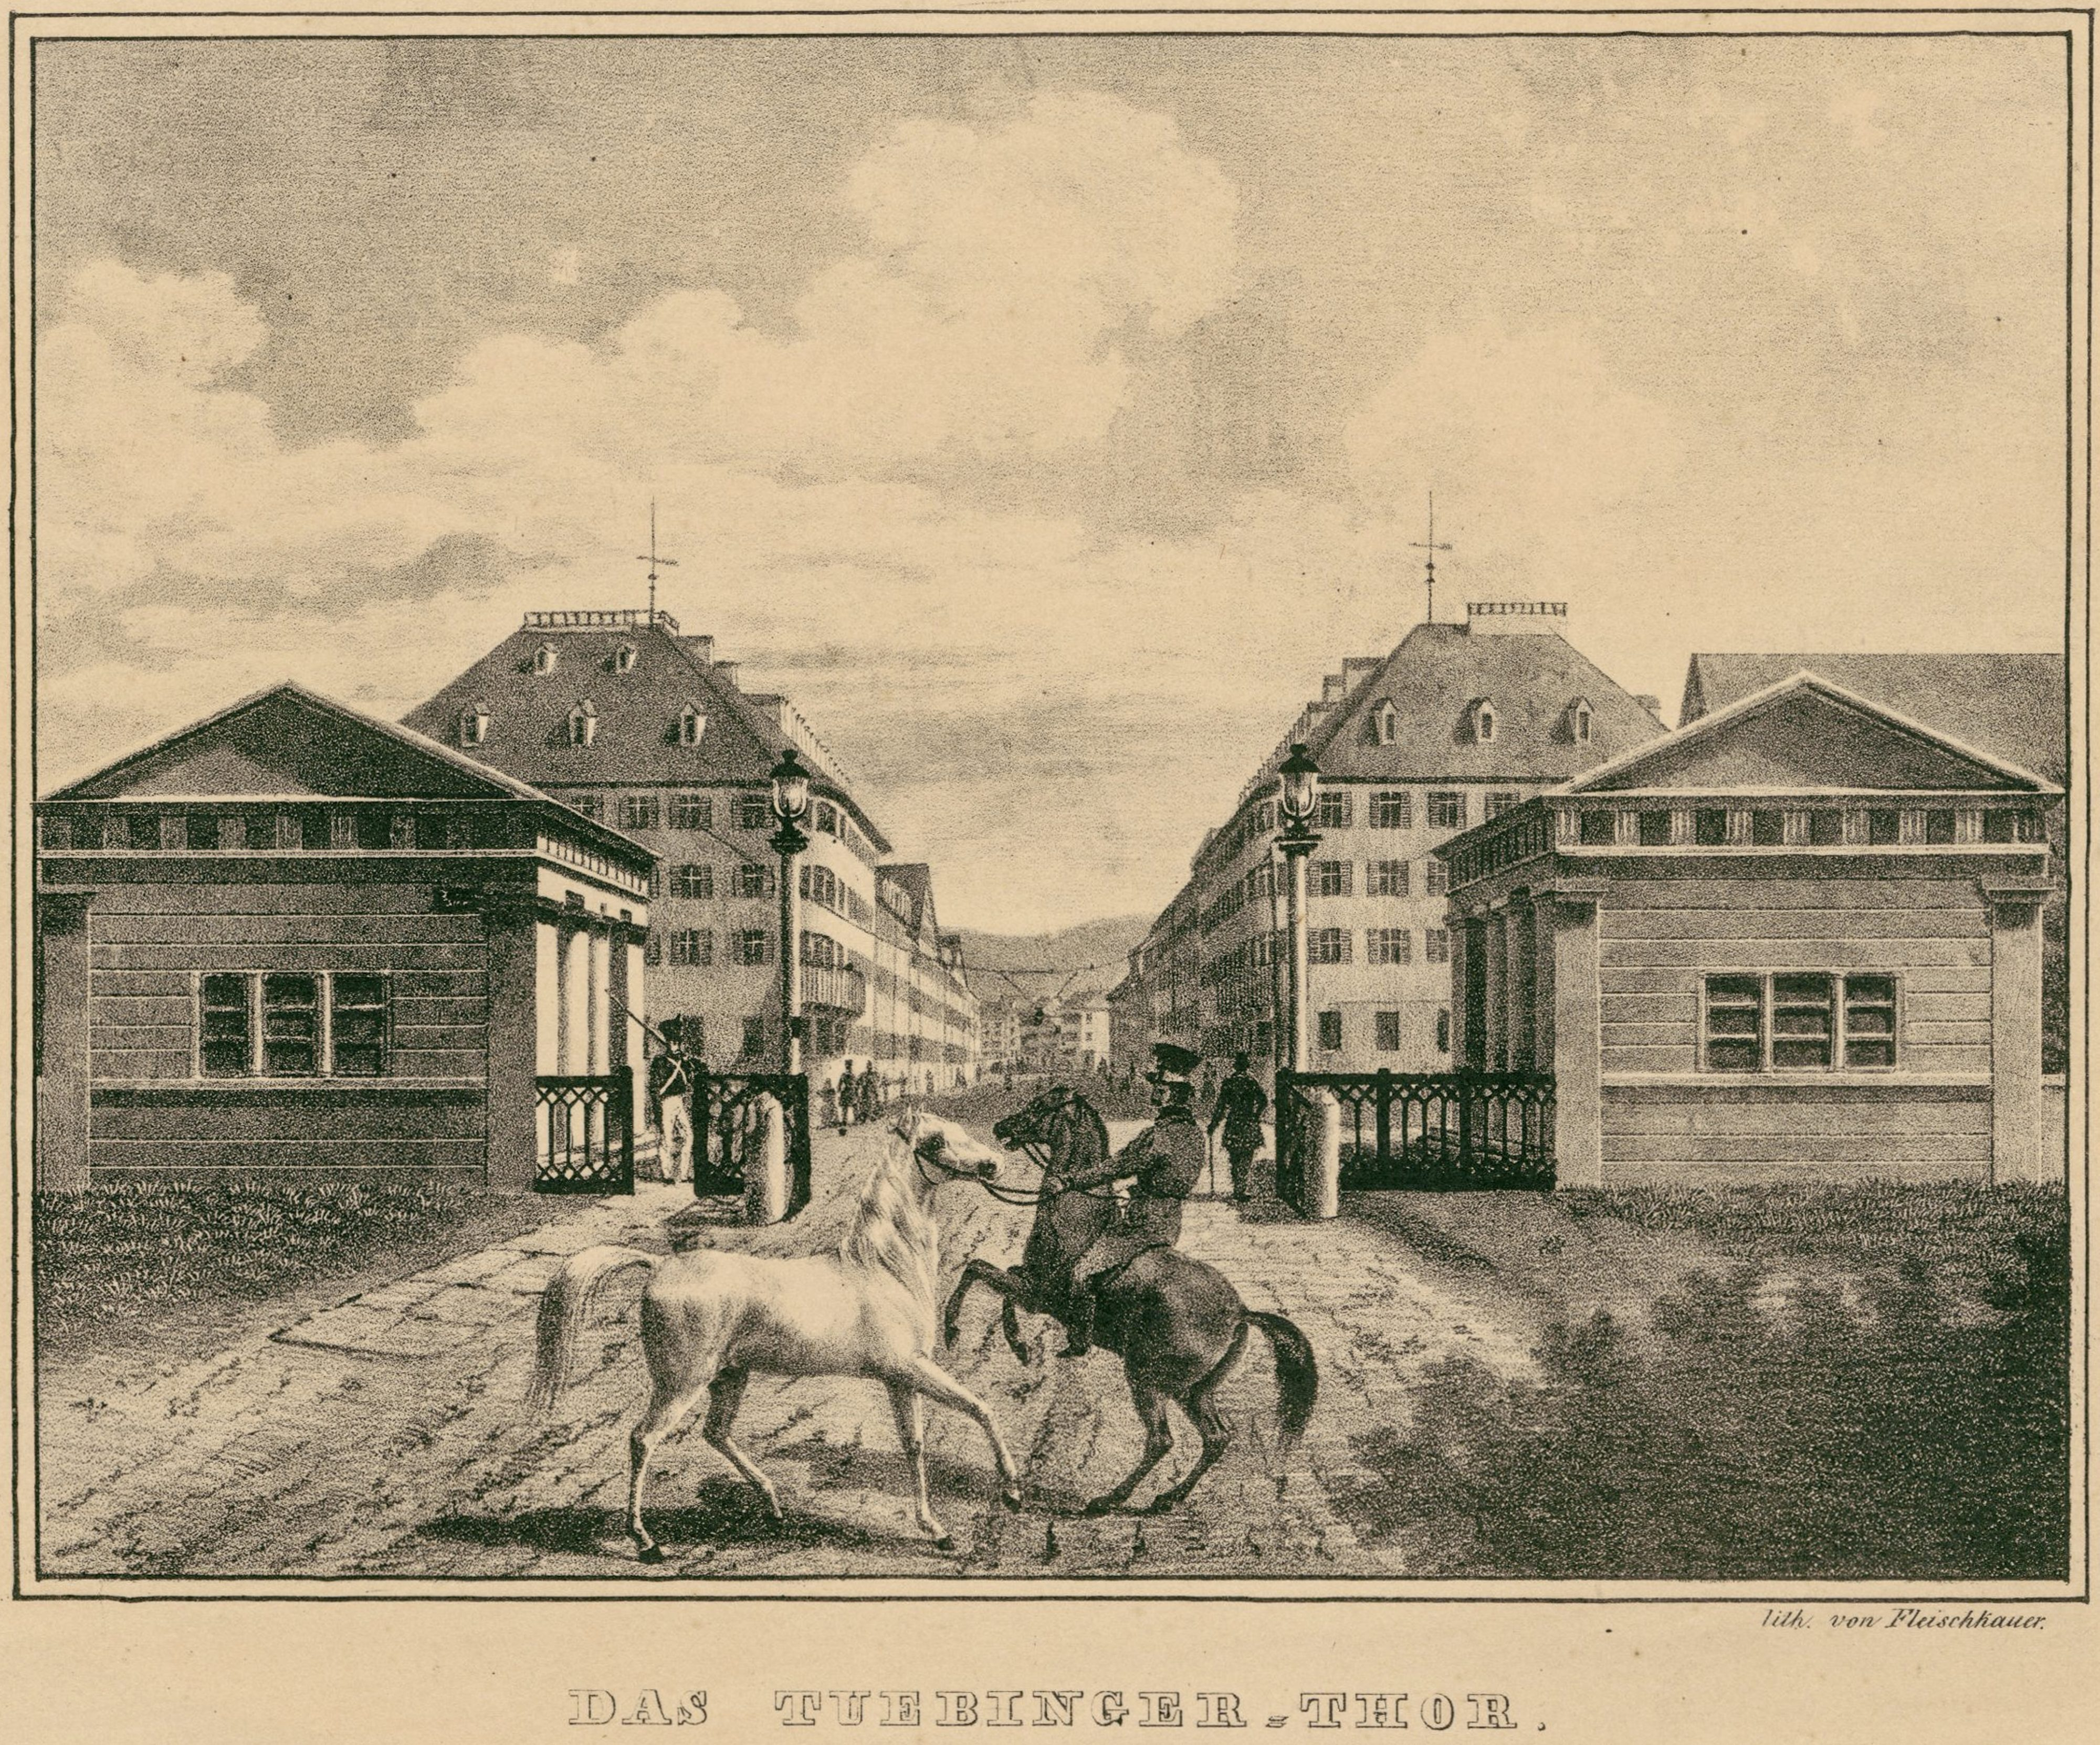 Bairactar Stuttgart Tübinger Tor Österreichischer Platz